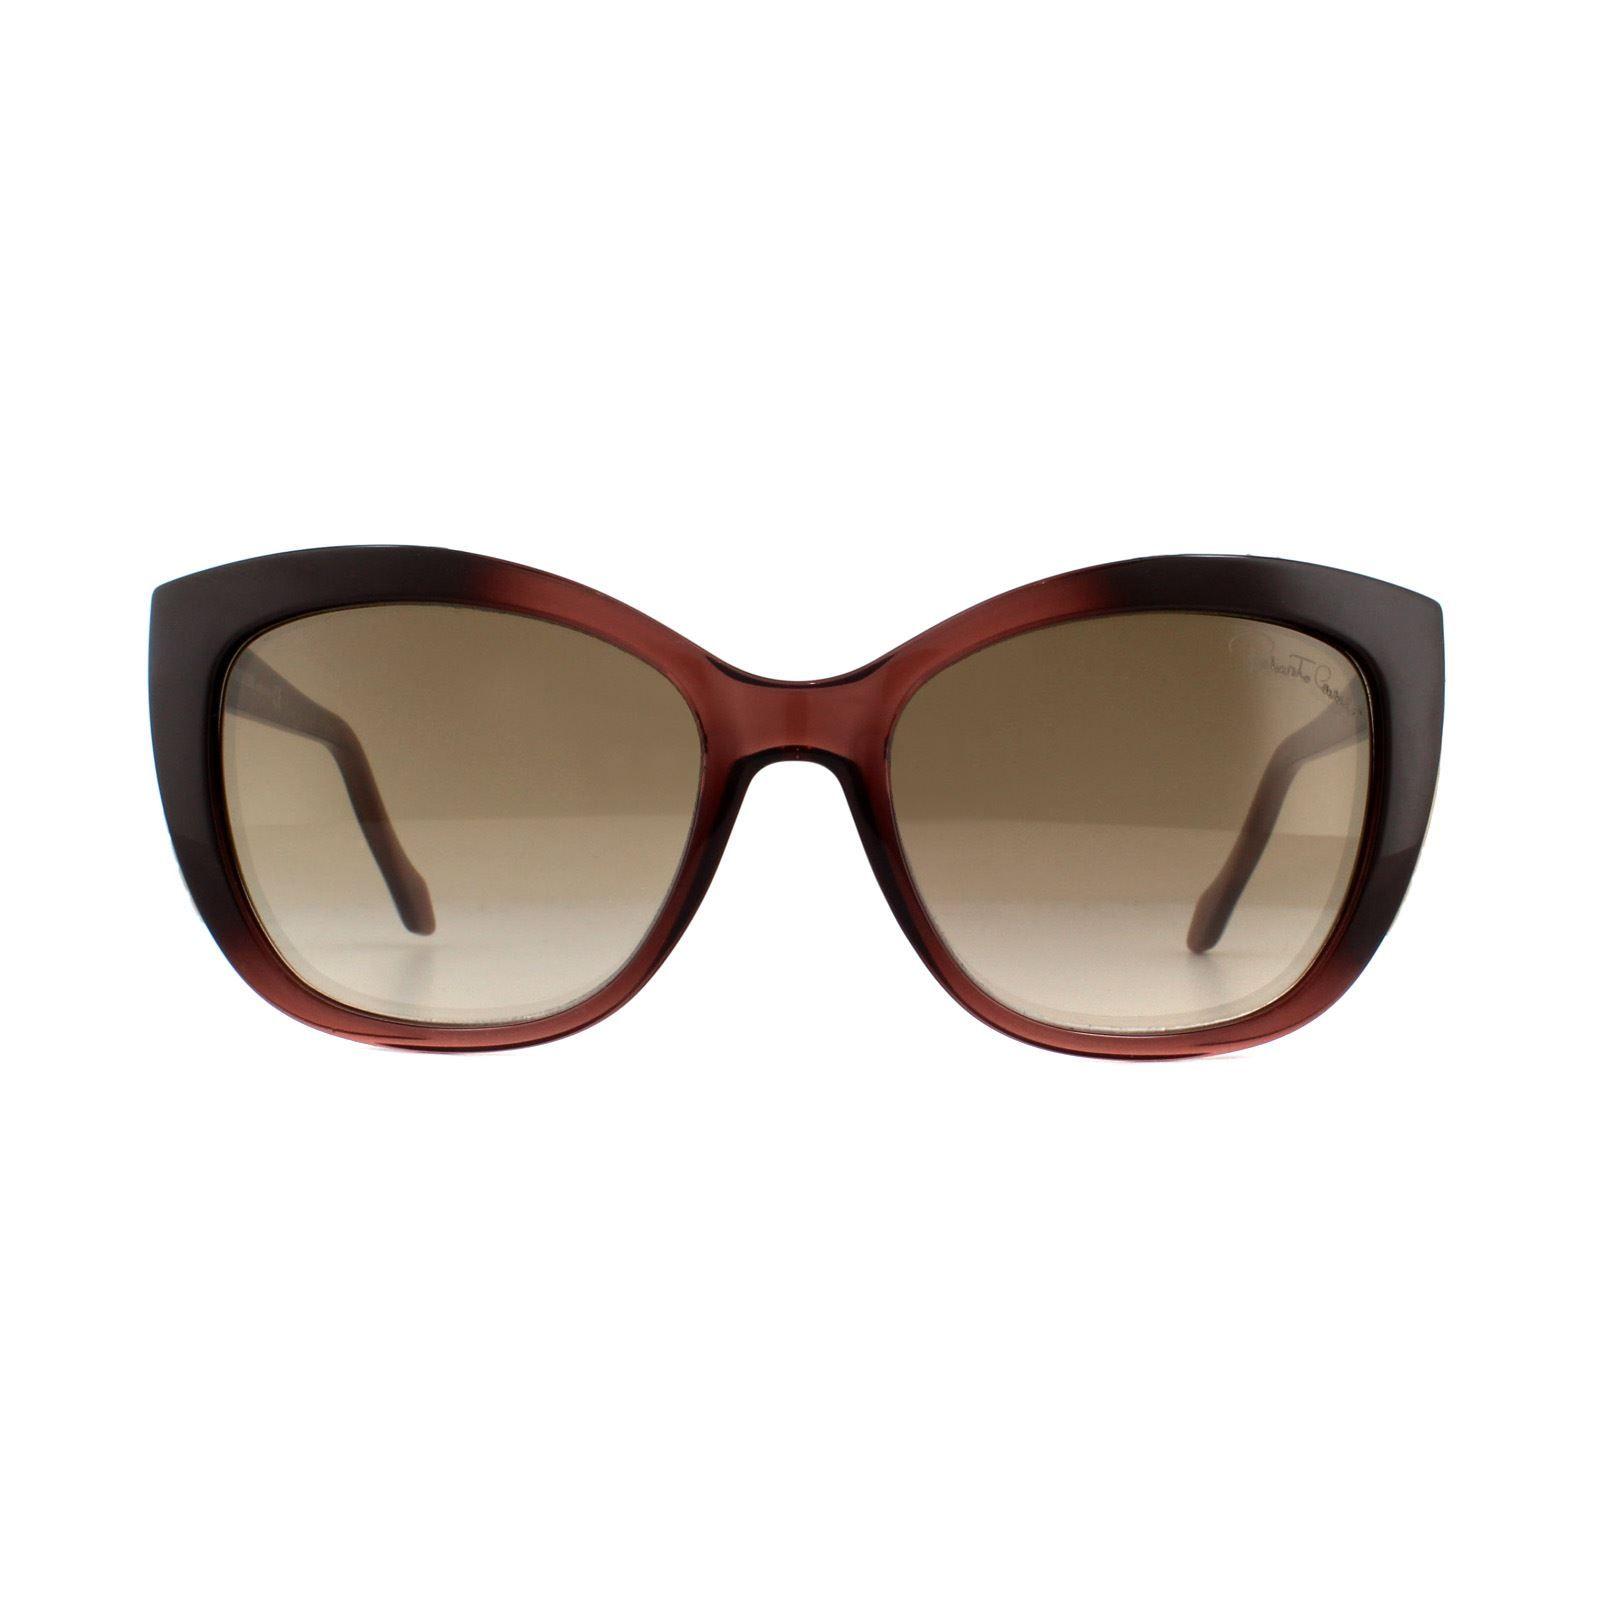 Roberto Cavalli Sunglasses Mekbuda RC888S 83G Violet Brown Mirror